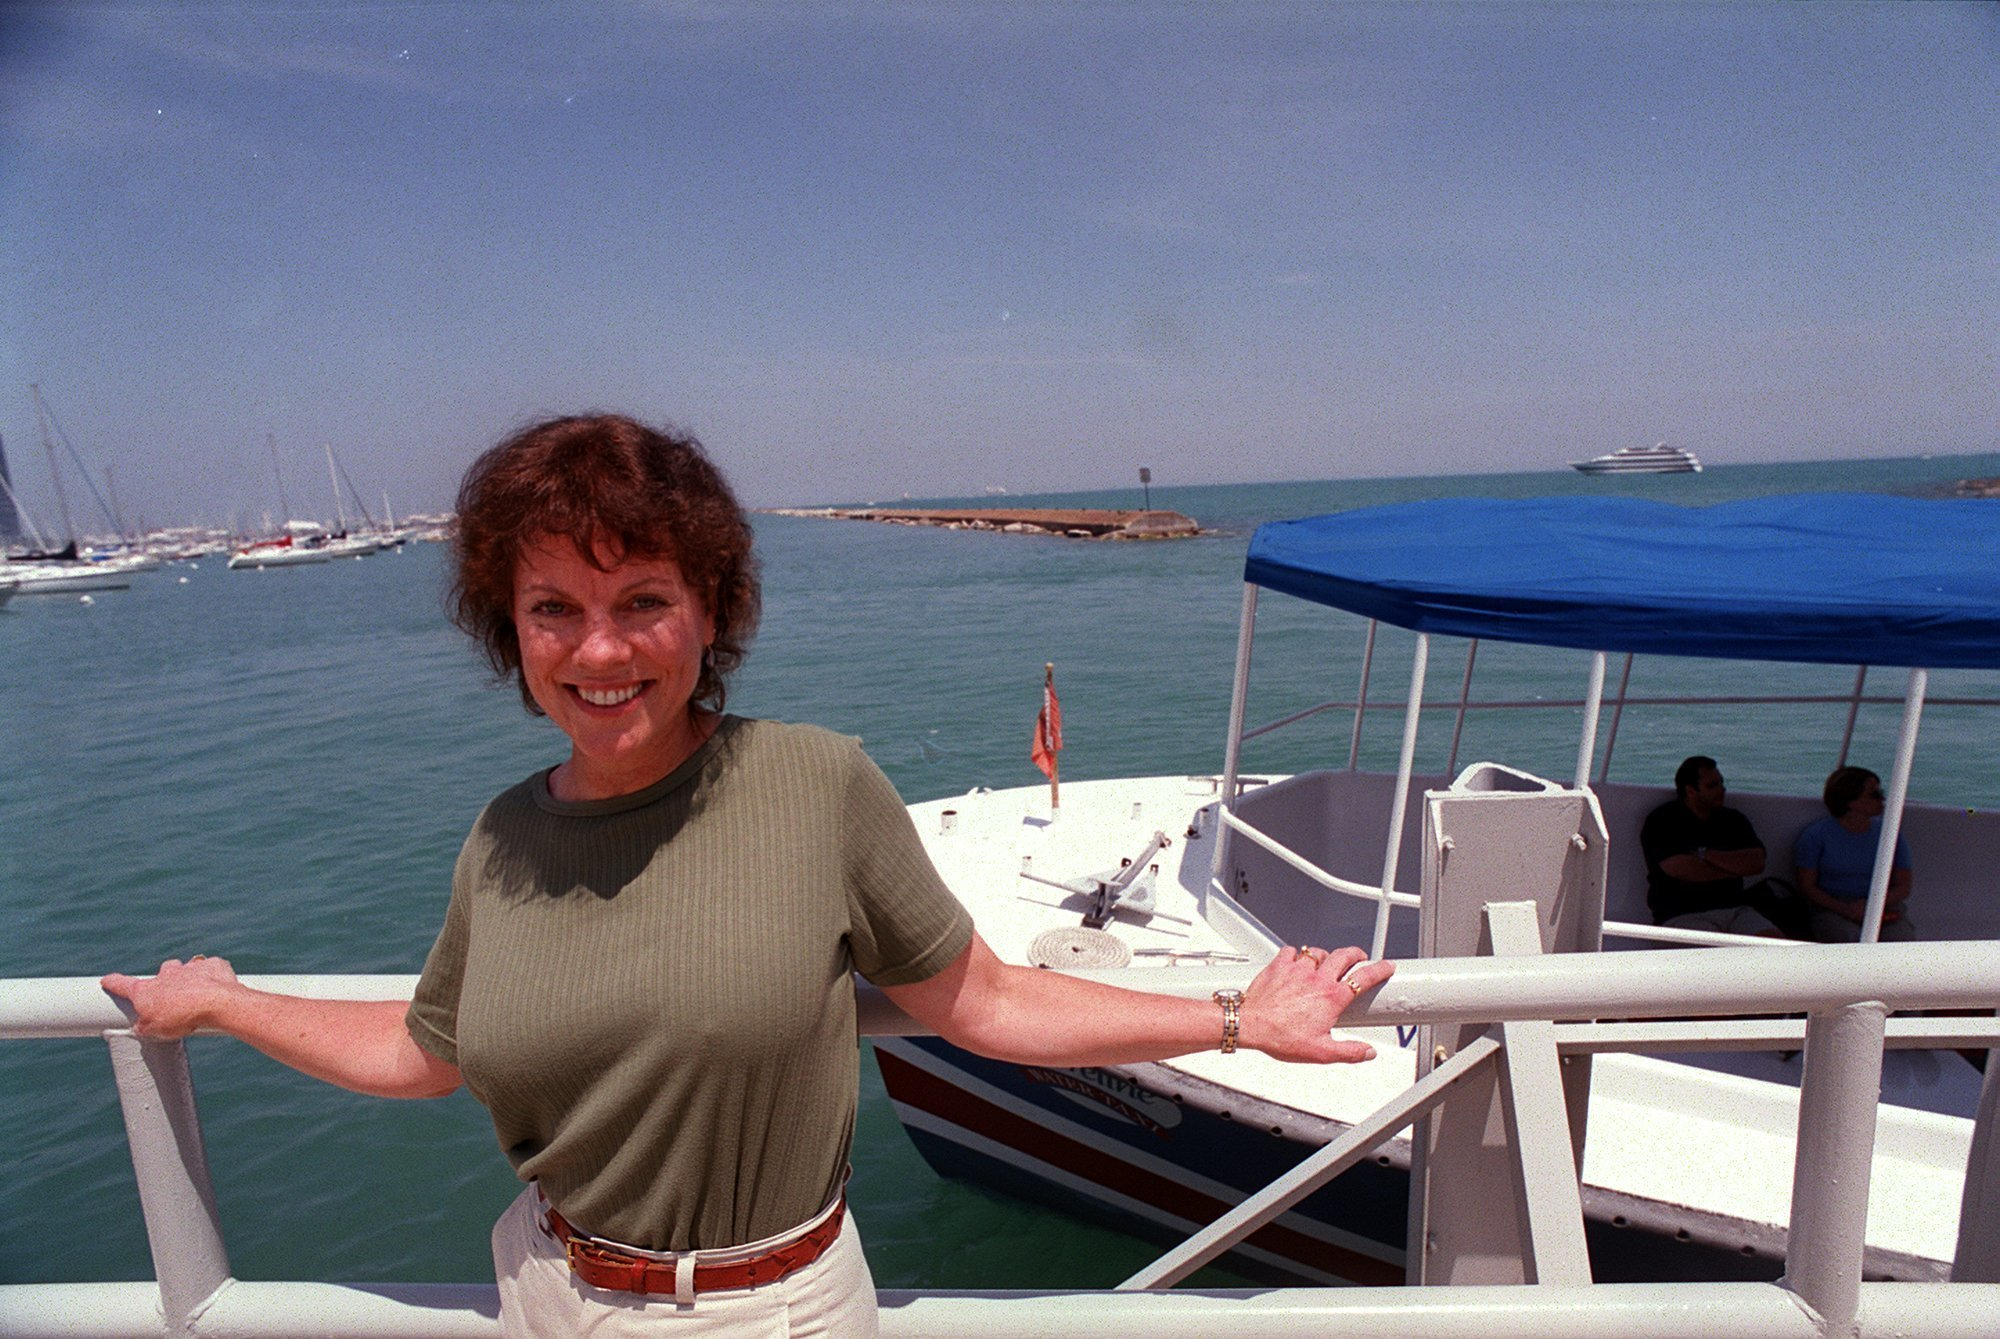 Joan Crawford,Tricia Helfer CAN 2 1997-1998 Adult videos Kelly Sullivan (actress),Kate Burton (born 1957 (born in Geneva, Switzerland